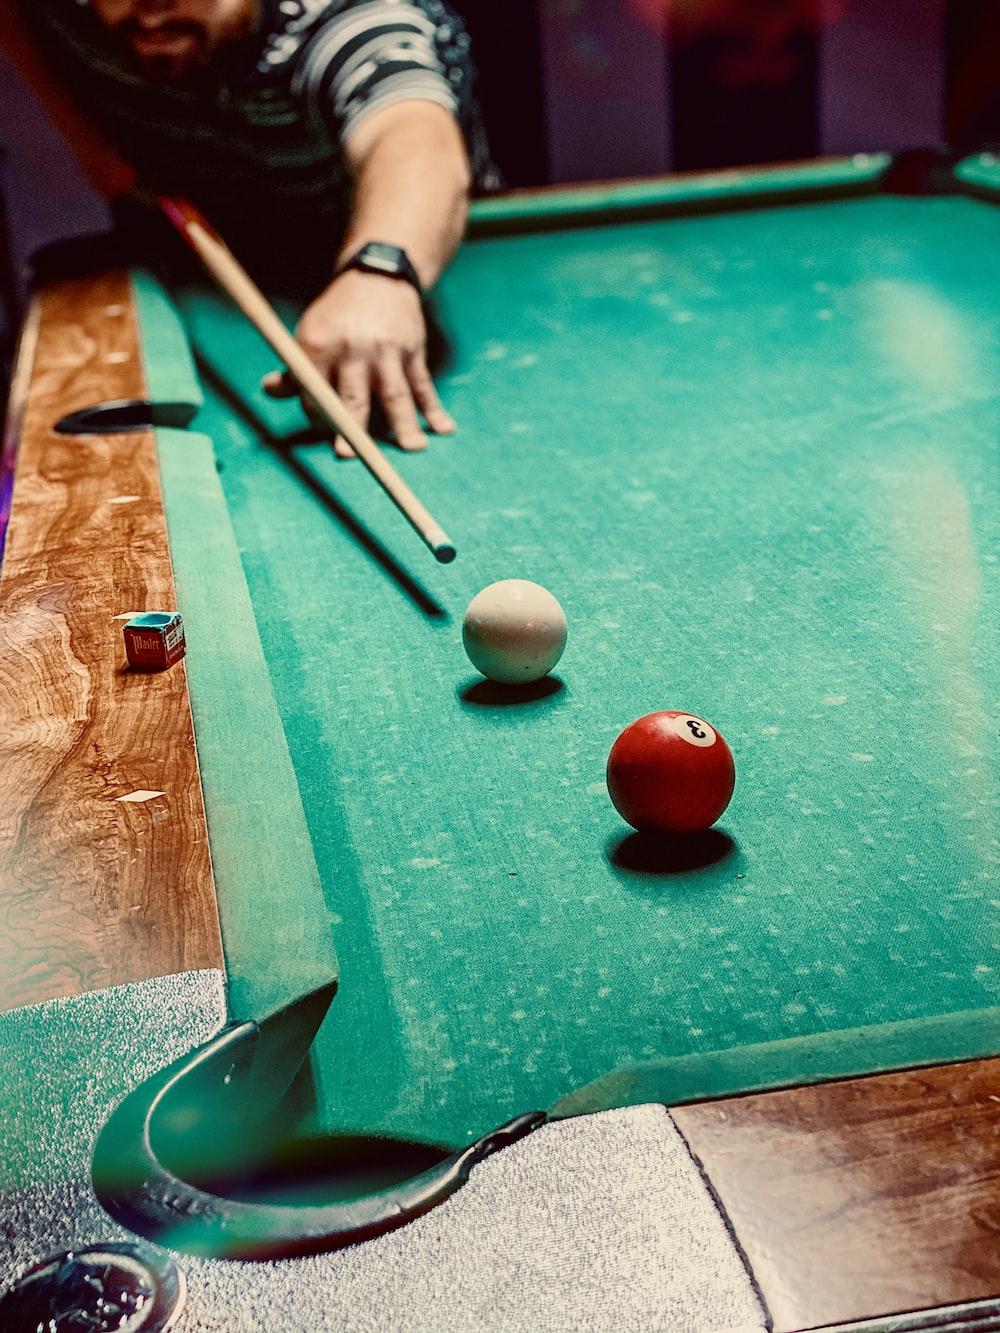 red tomato on green billiard table